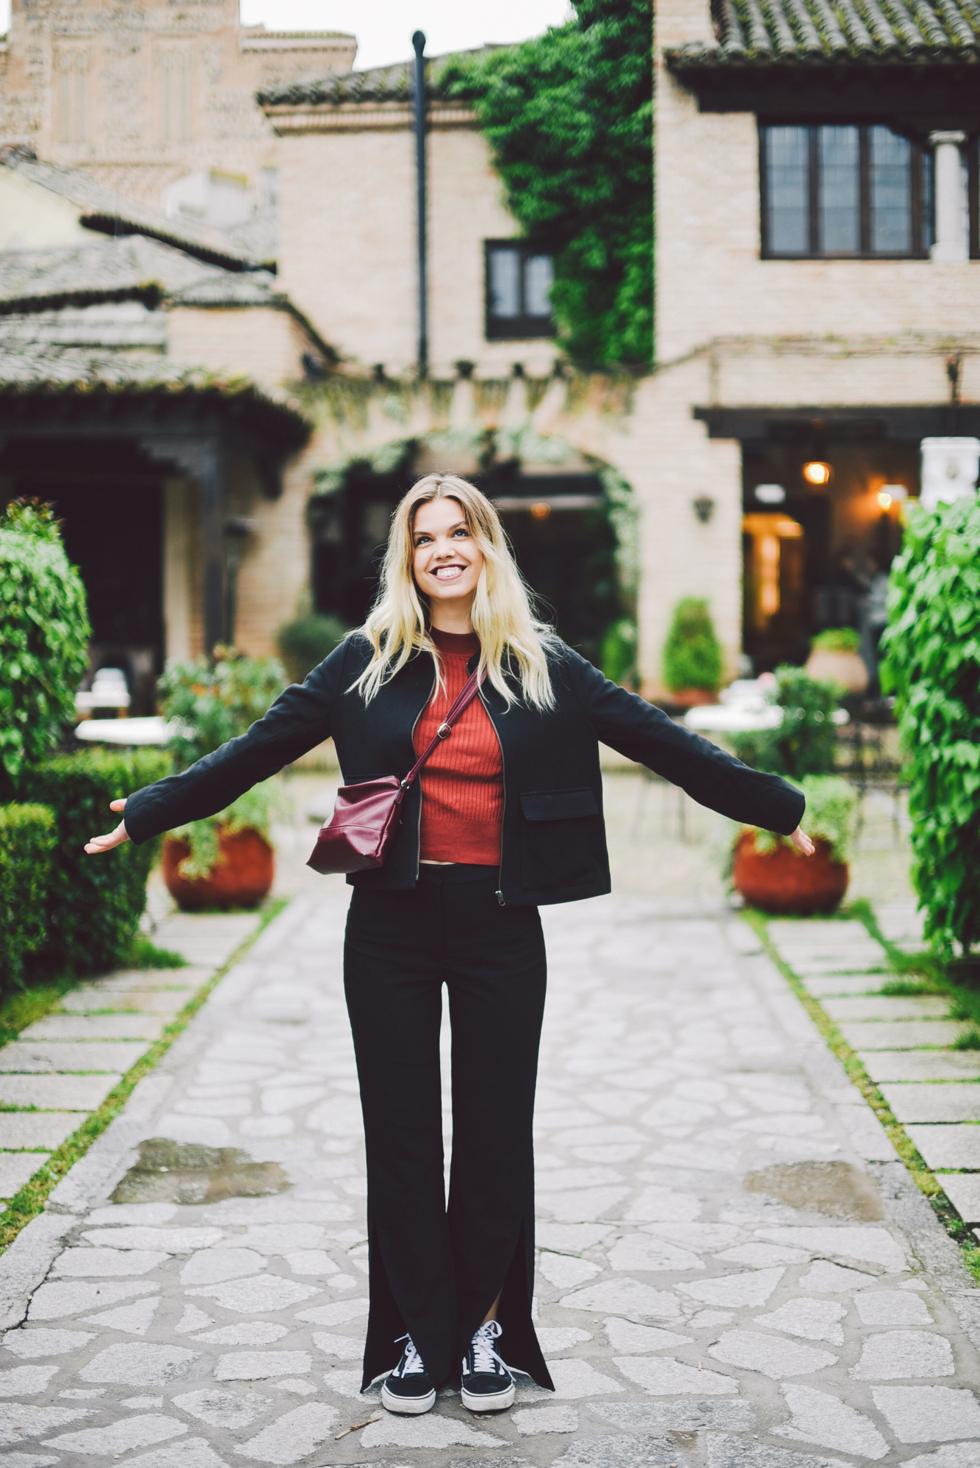 Outfit Flora Wiström, florasblogg.se, @florawis